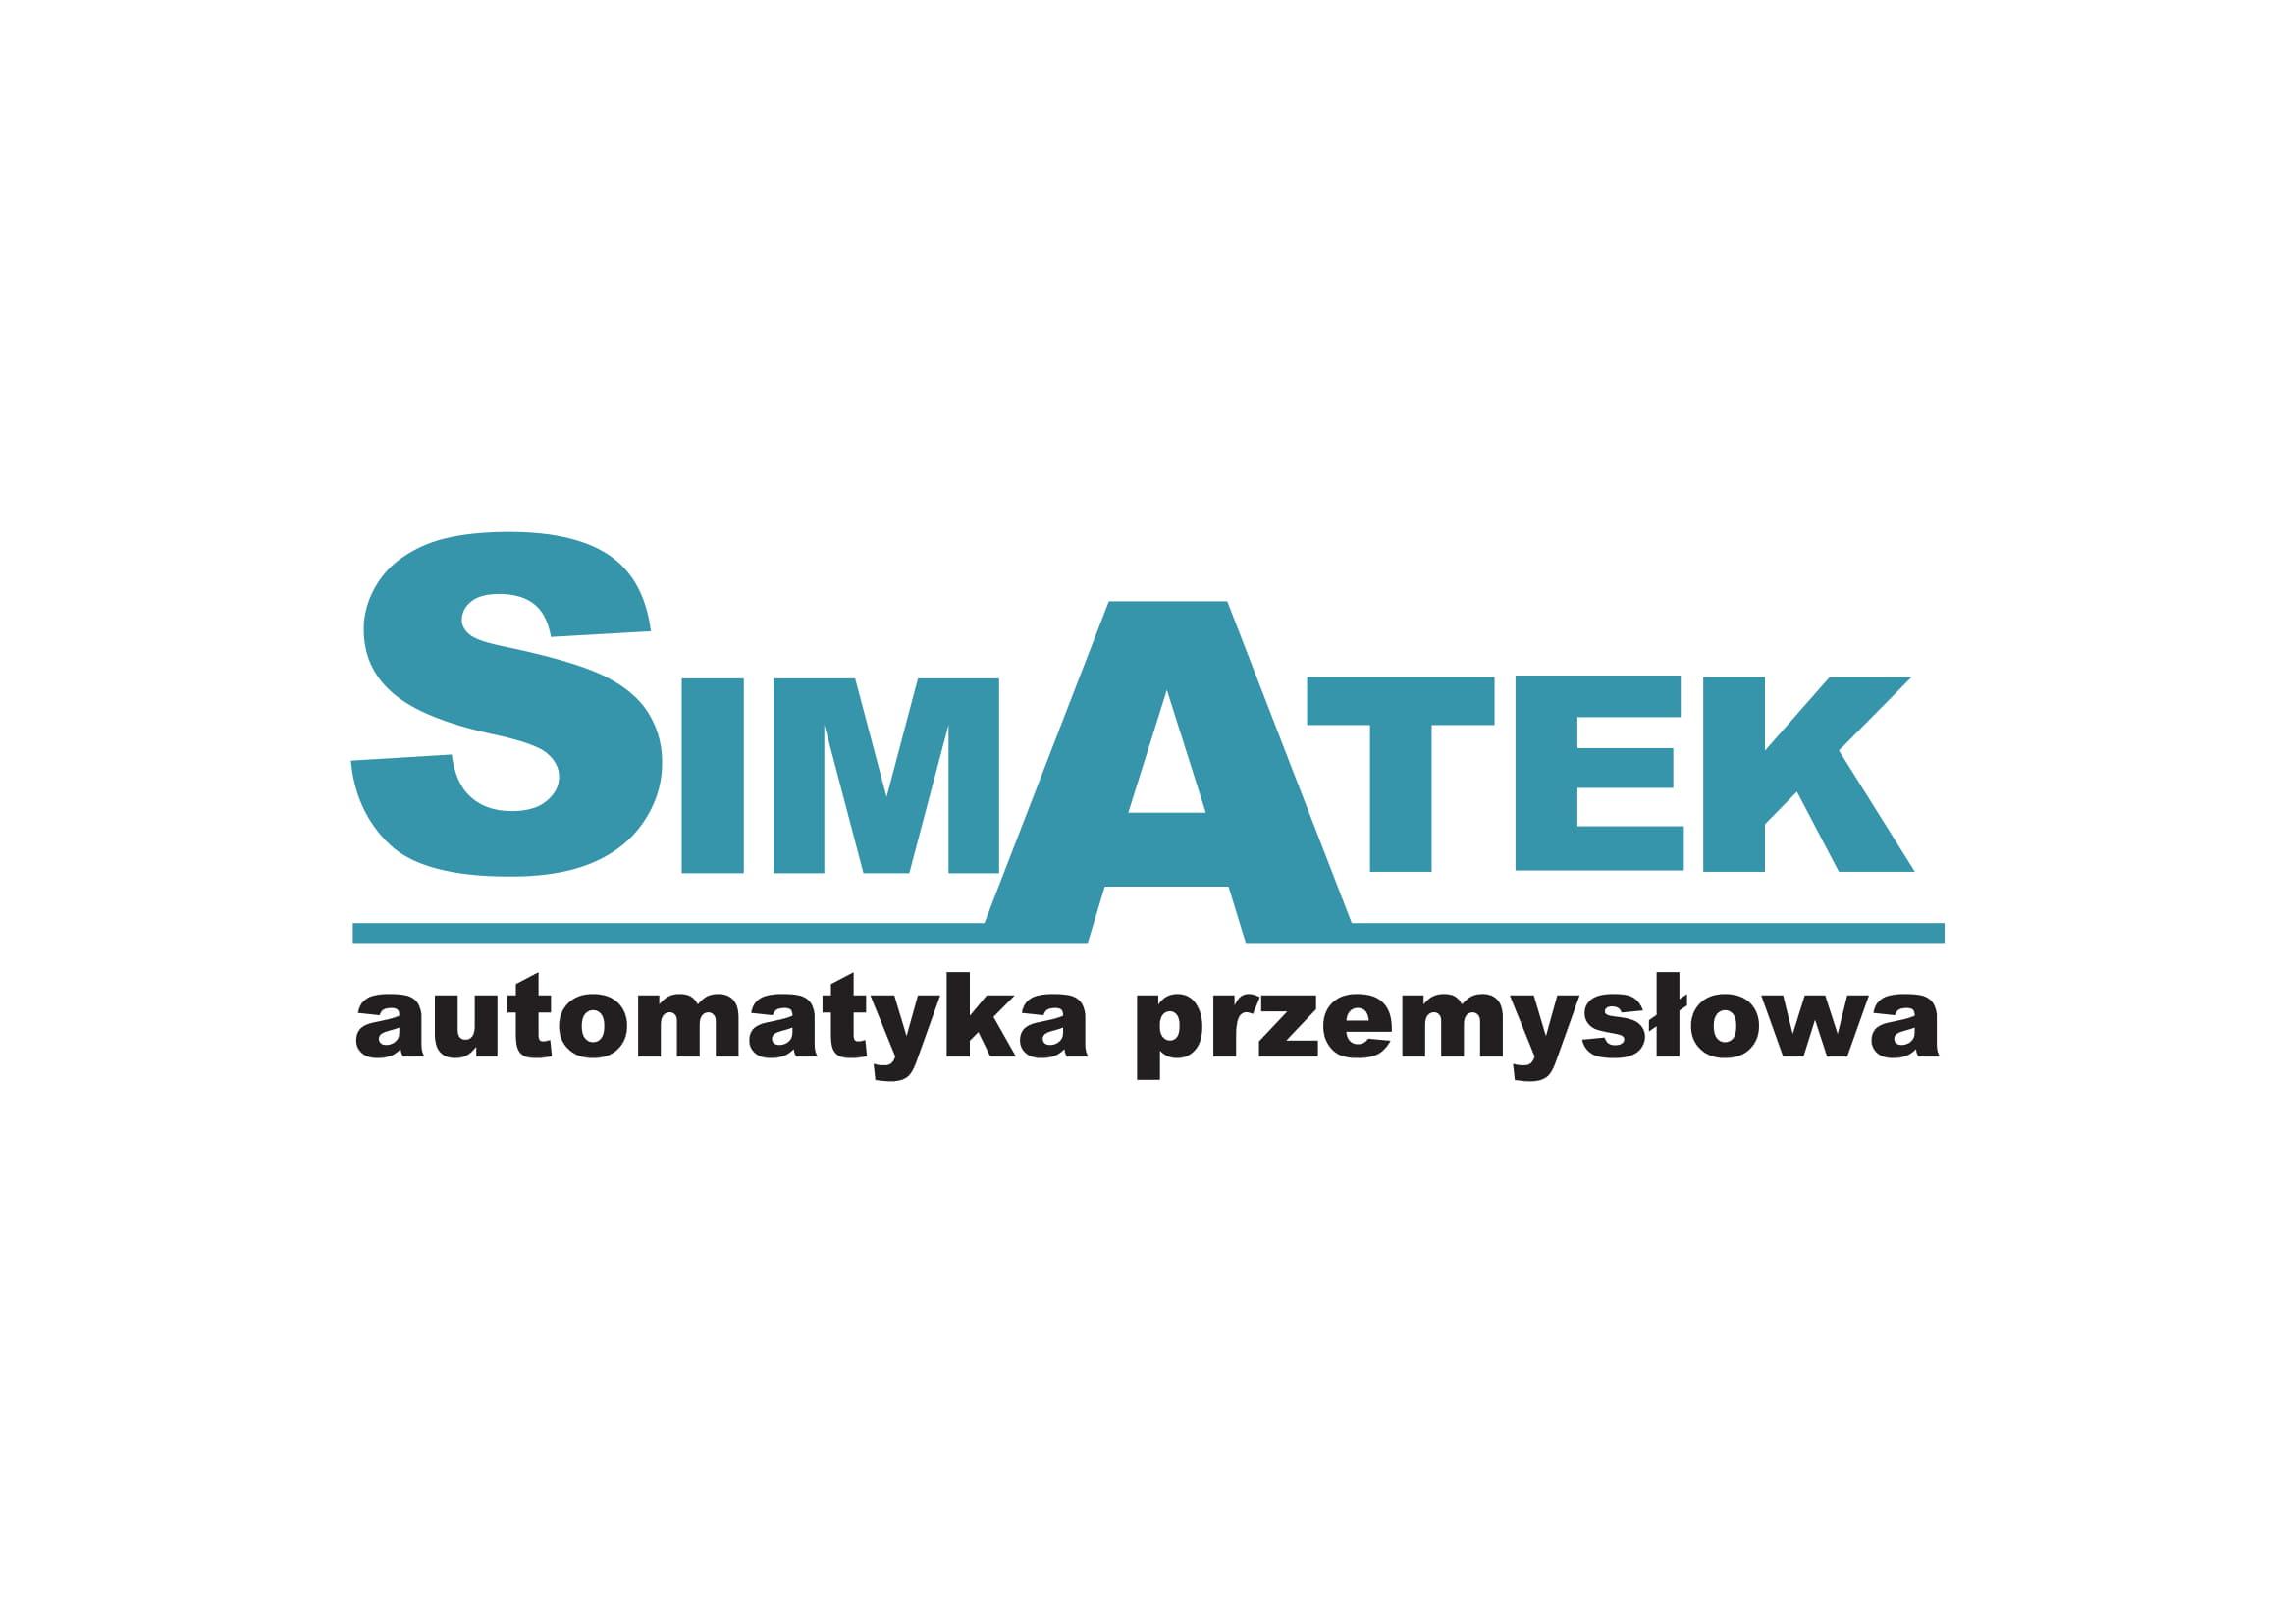 logo_simatek-1